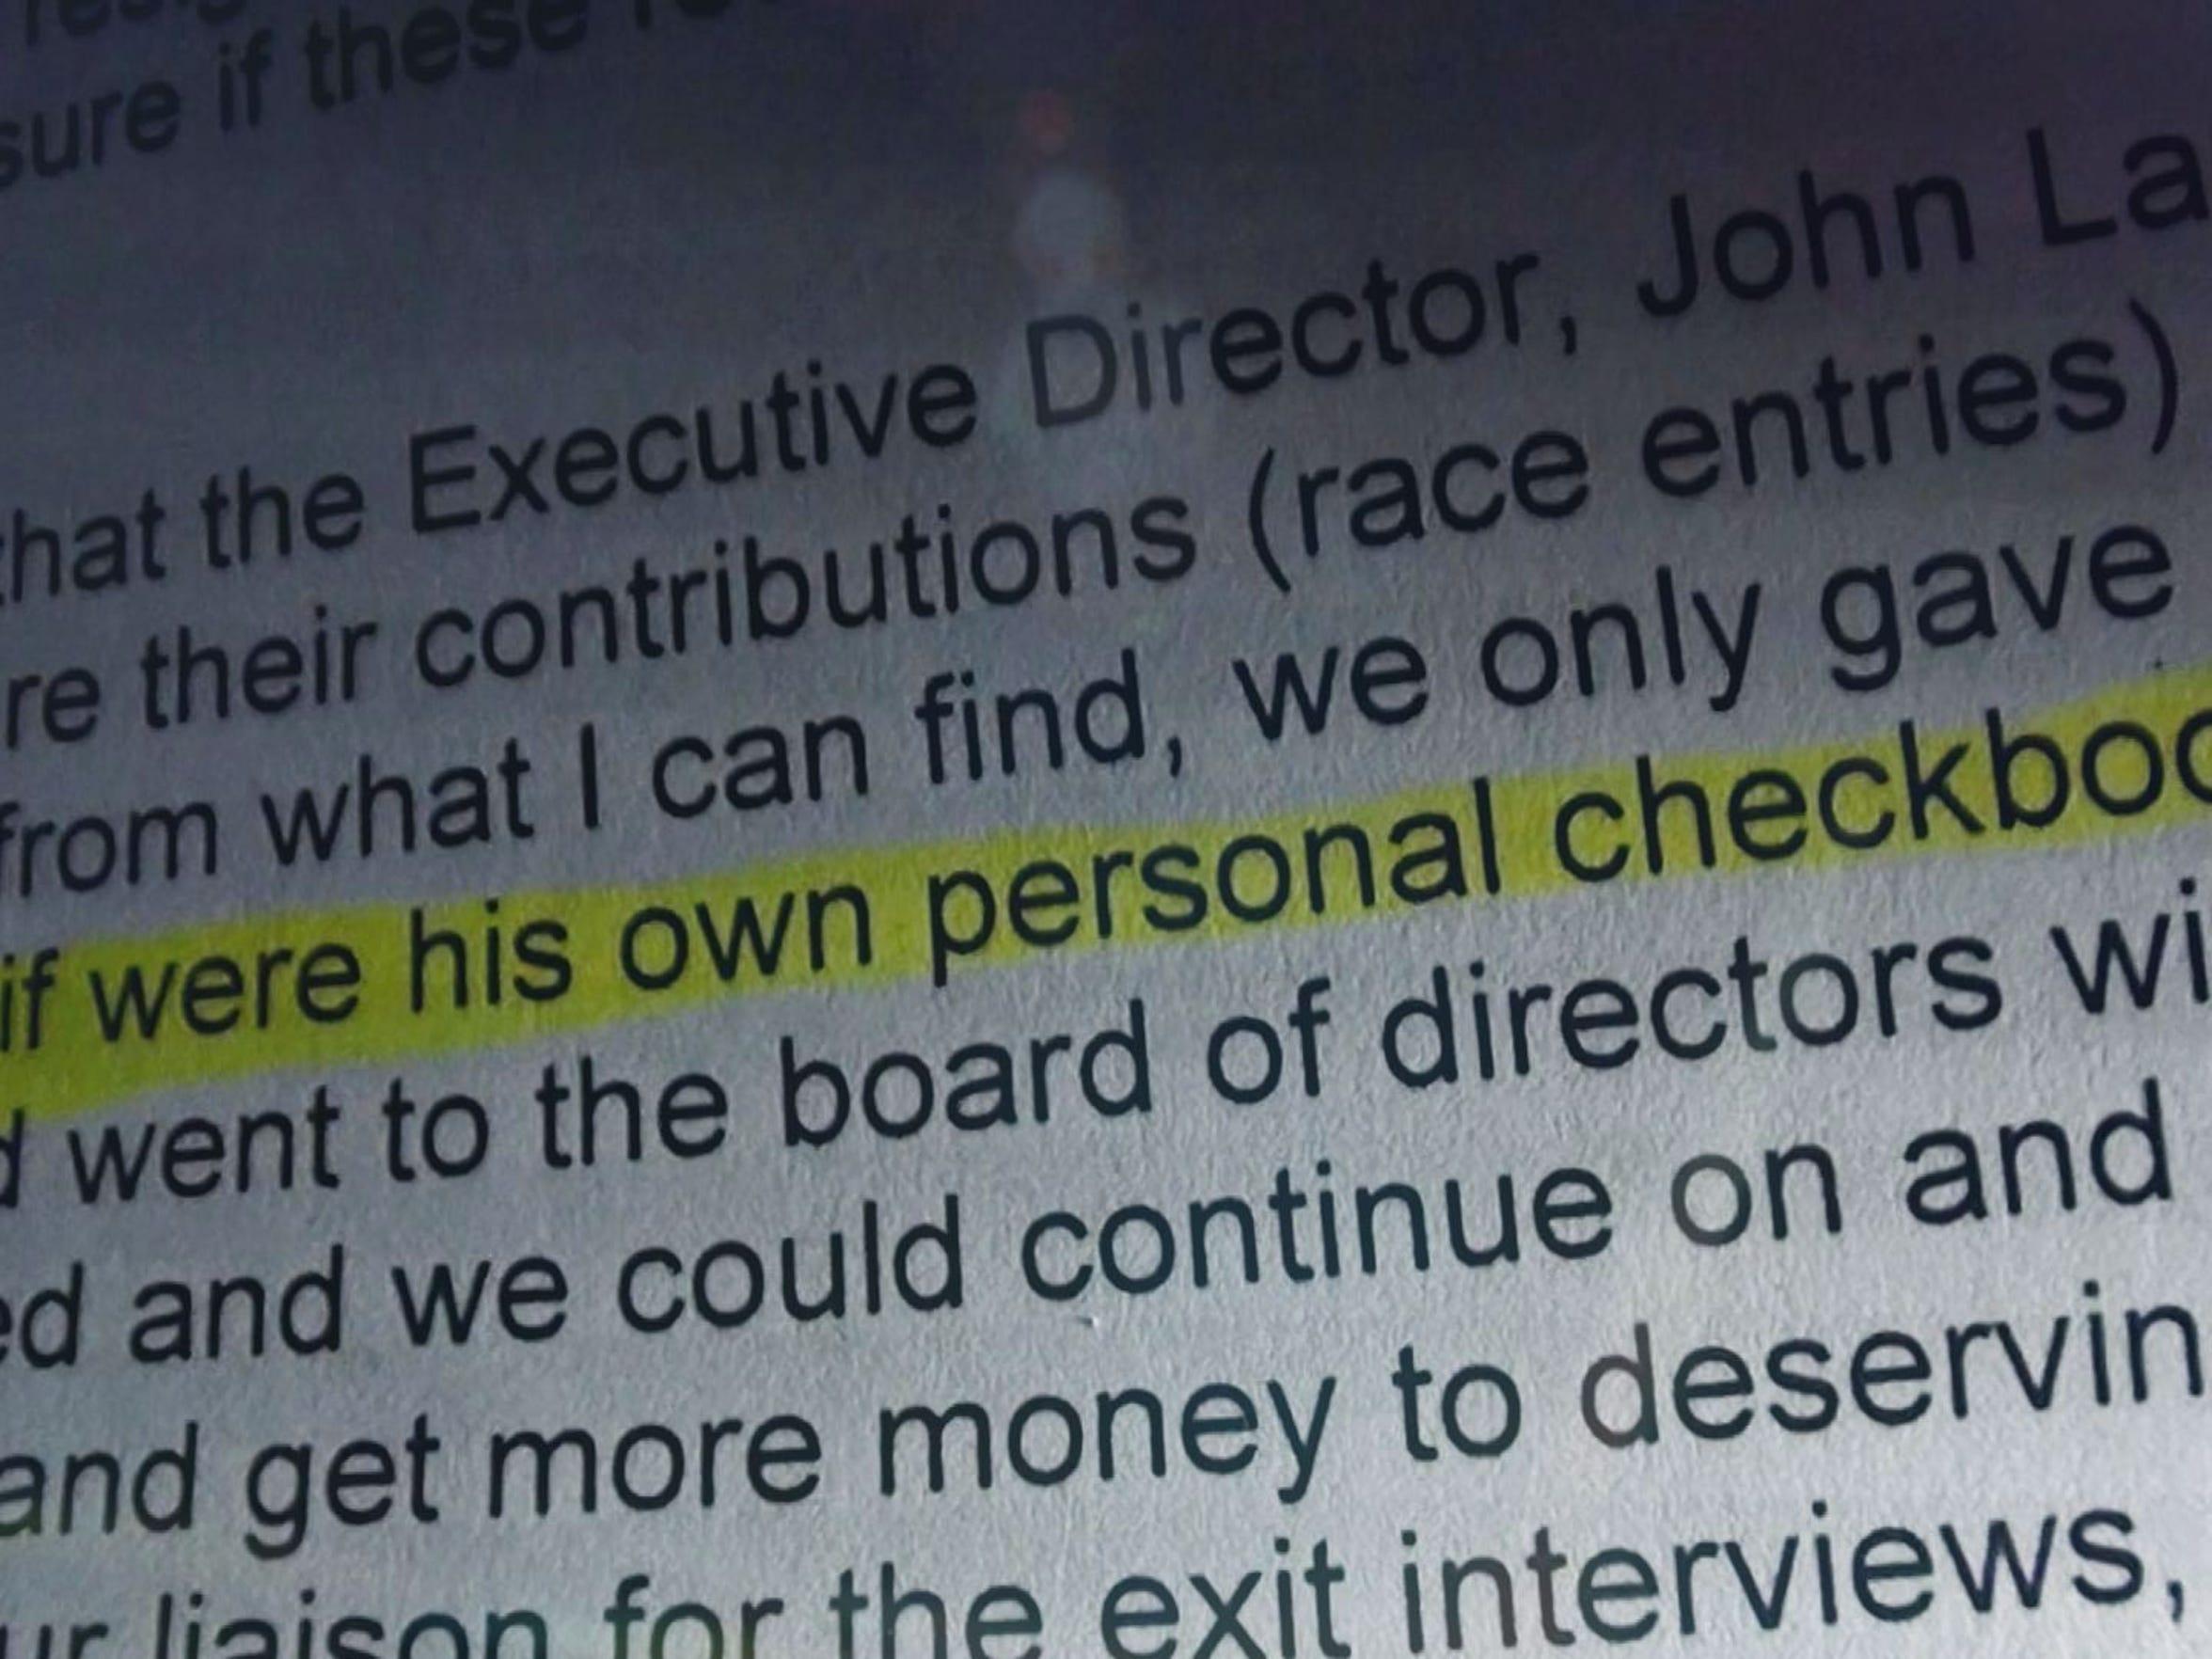 Attorney General receives complaint against John Larson.